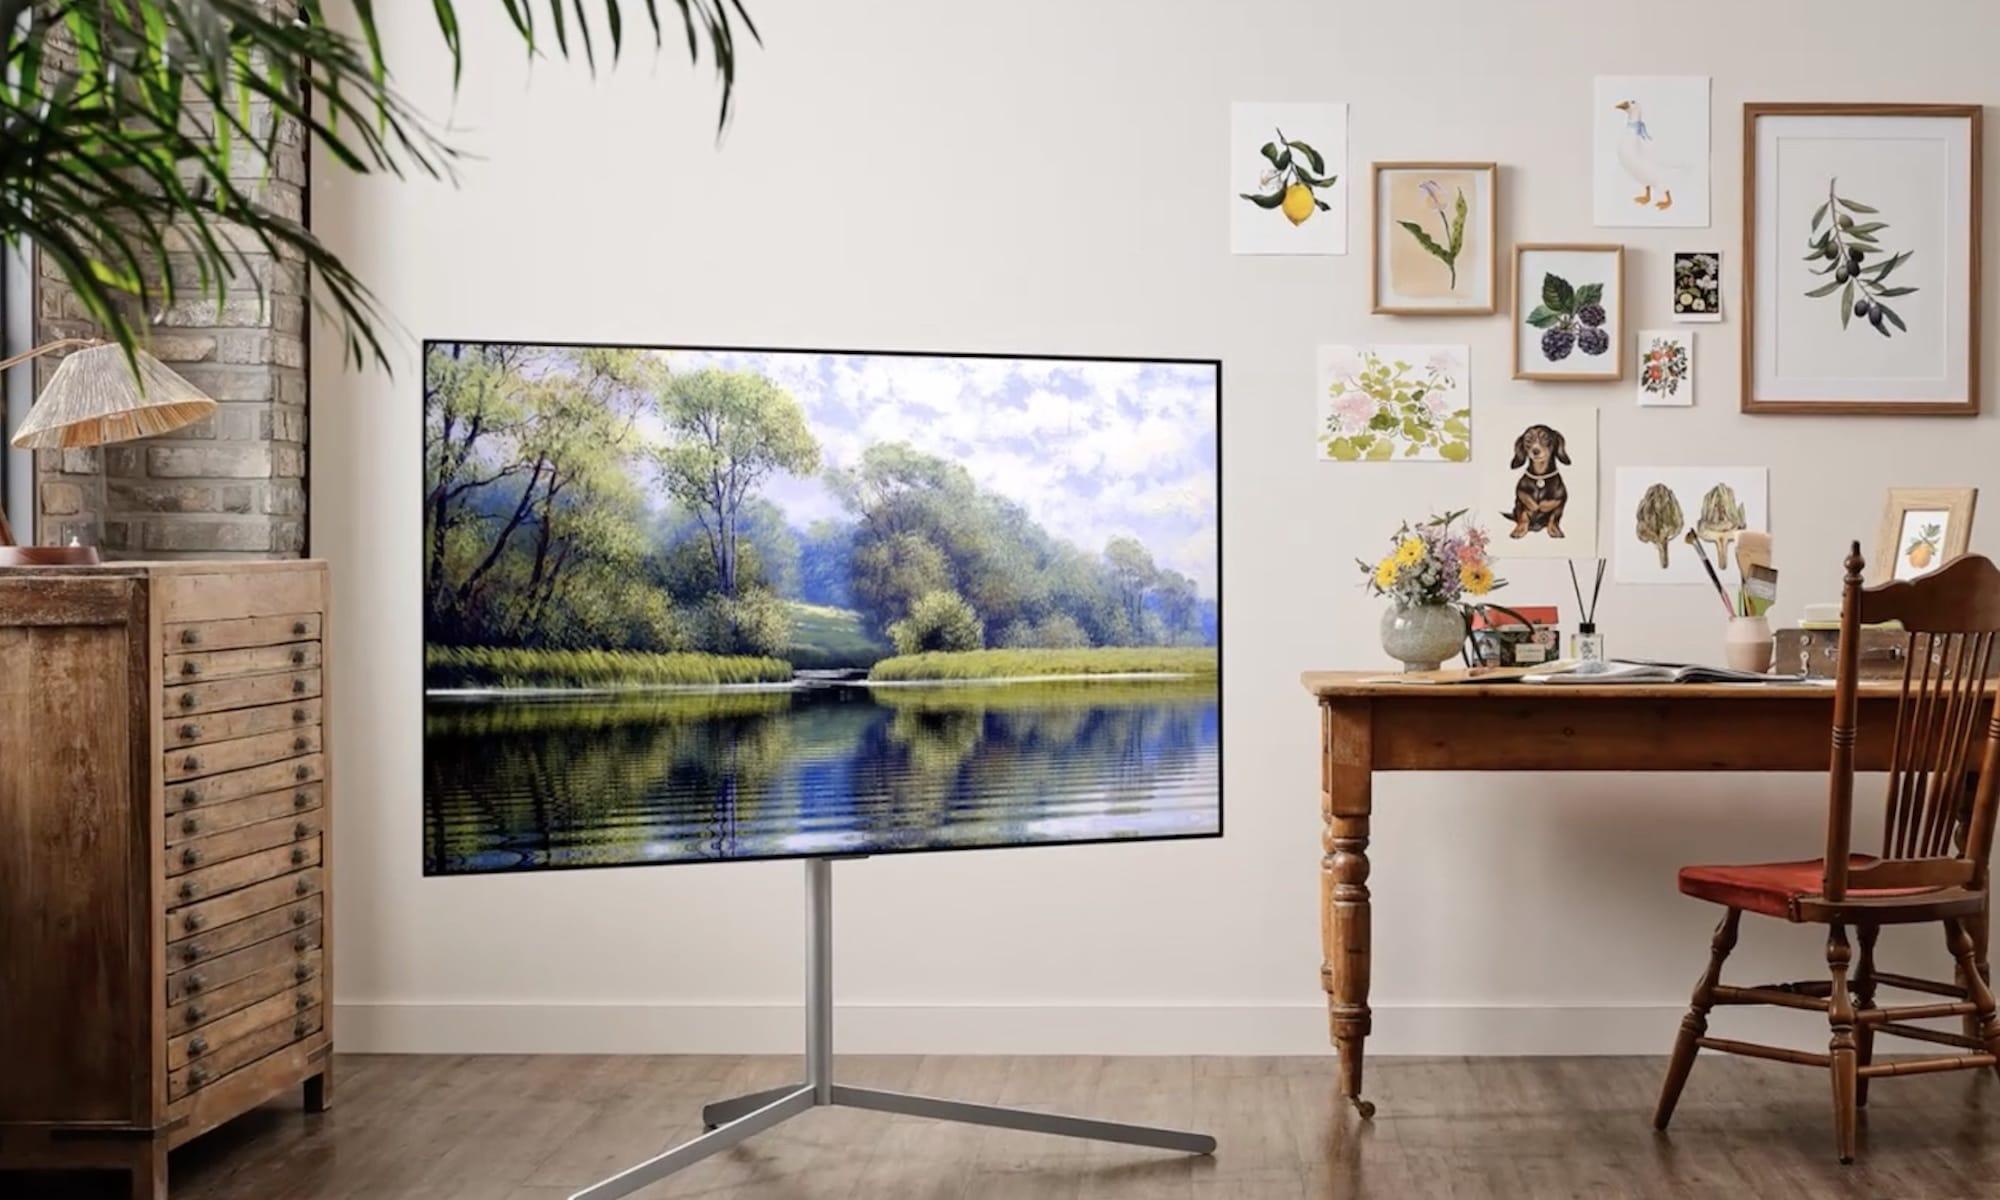 LG G1 Series OLED evo televisions